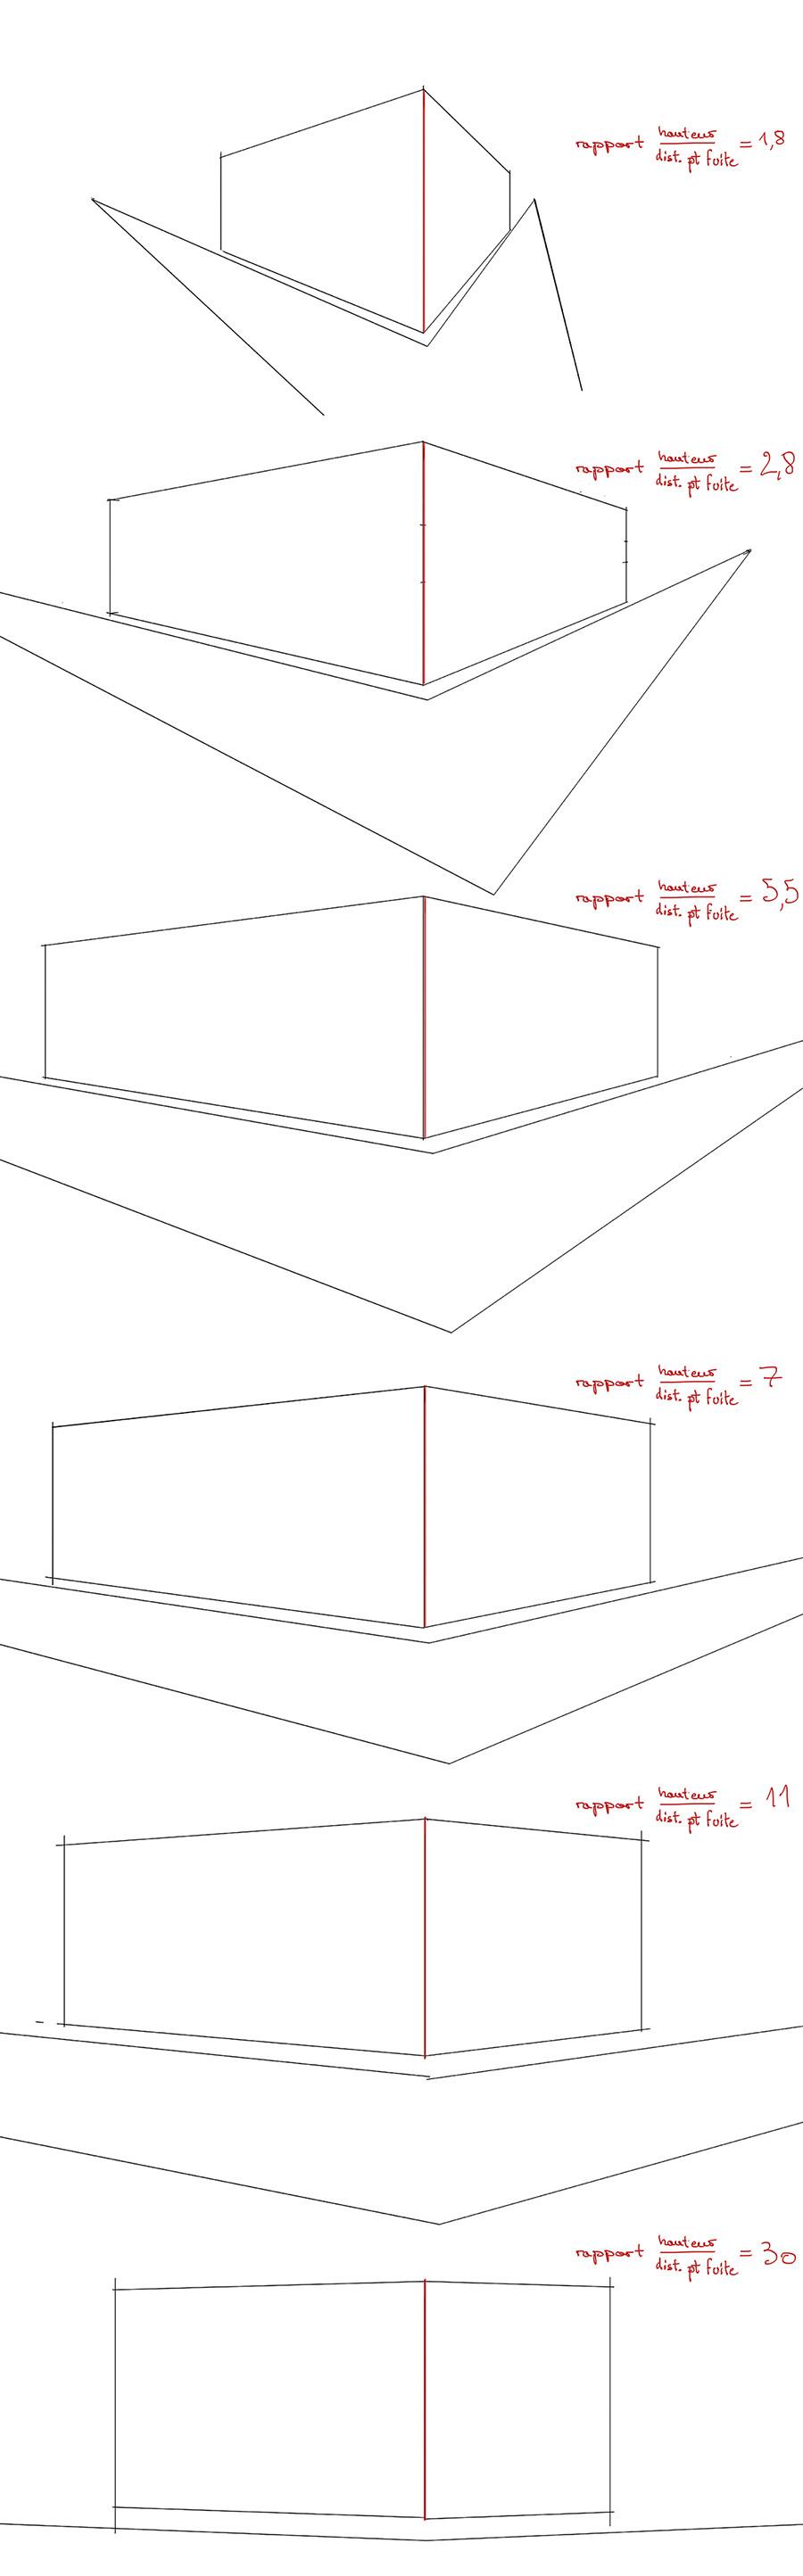 Atelier Backache - Page 5 Rappor10